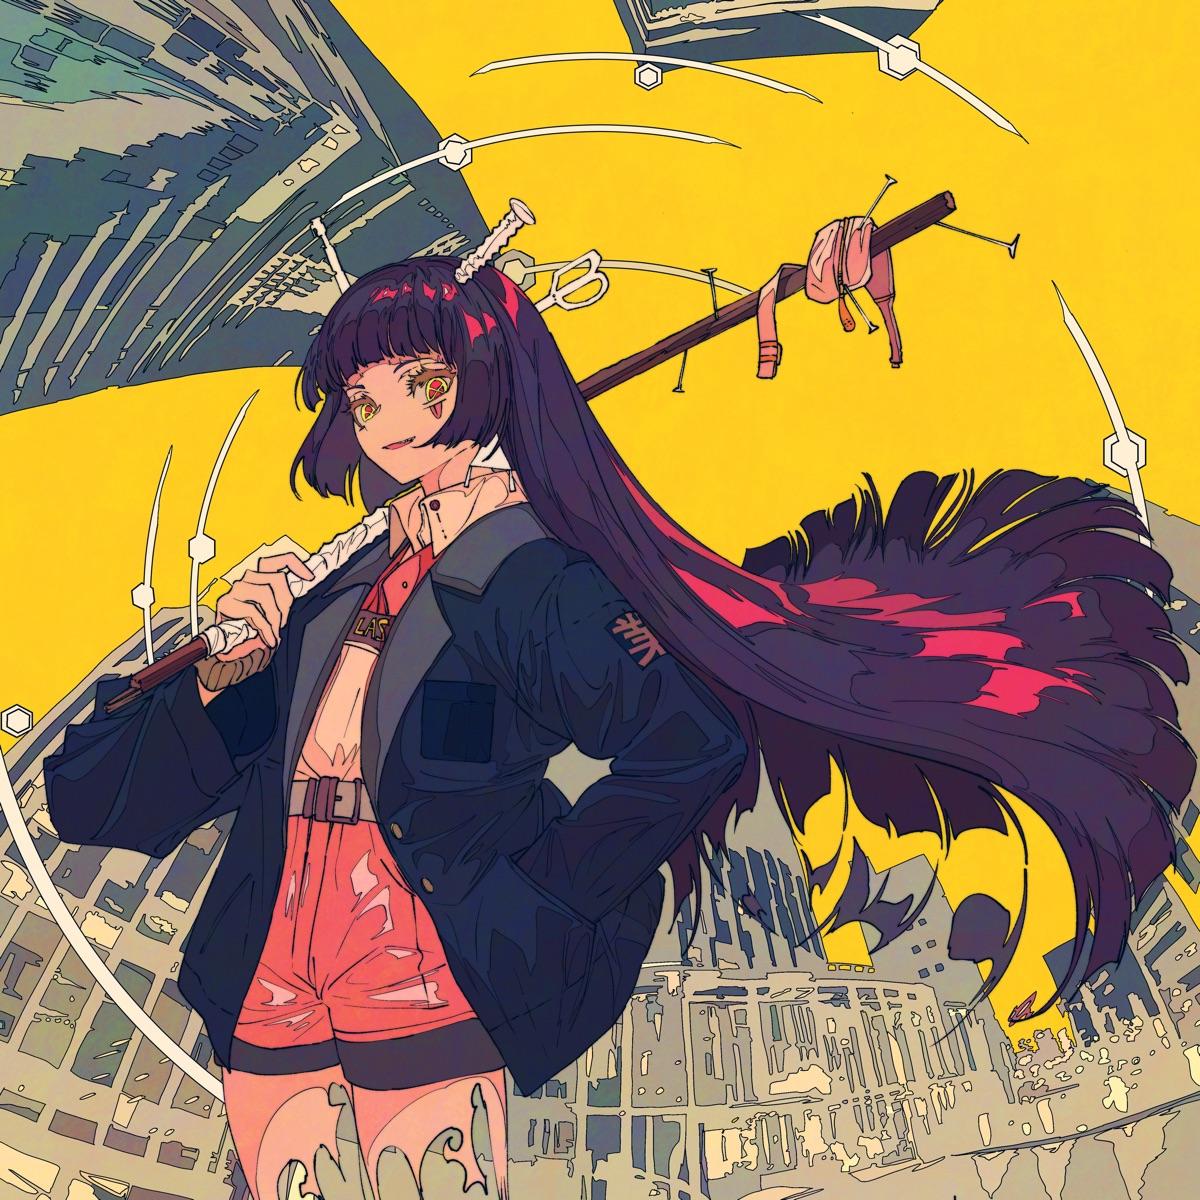 『Ayase - ハッピーエンダー』収録の『幽霊東京』ジャケット